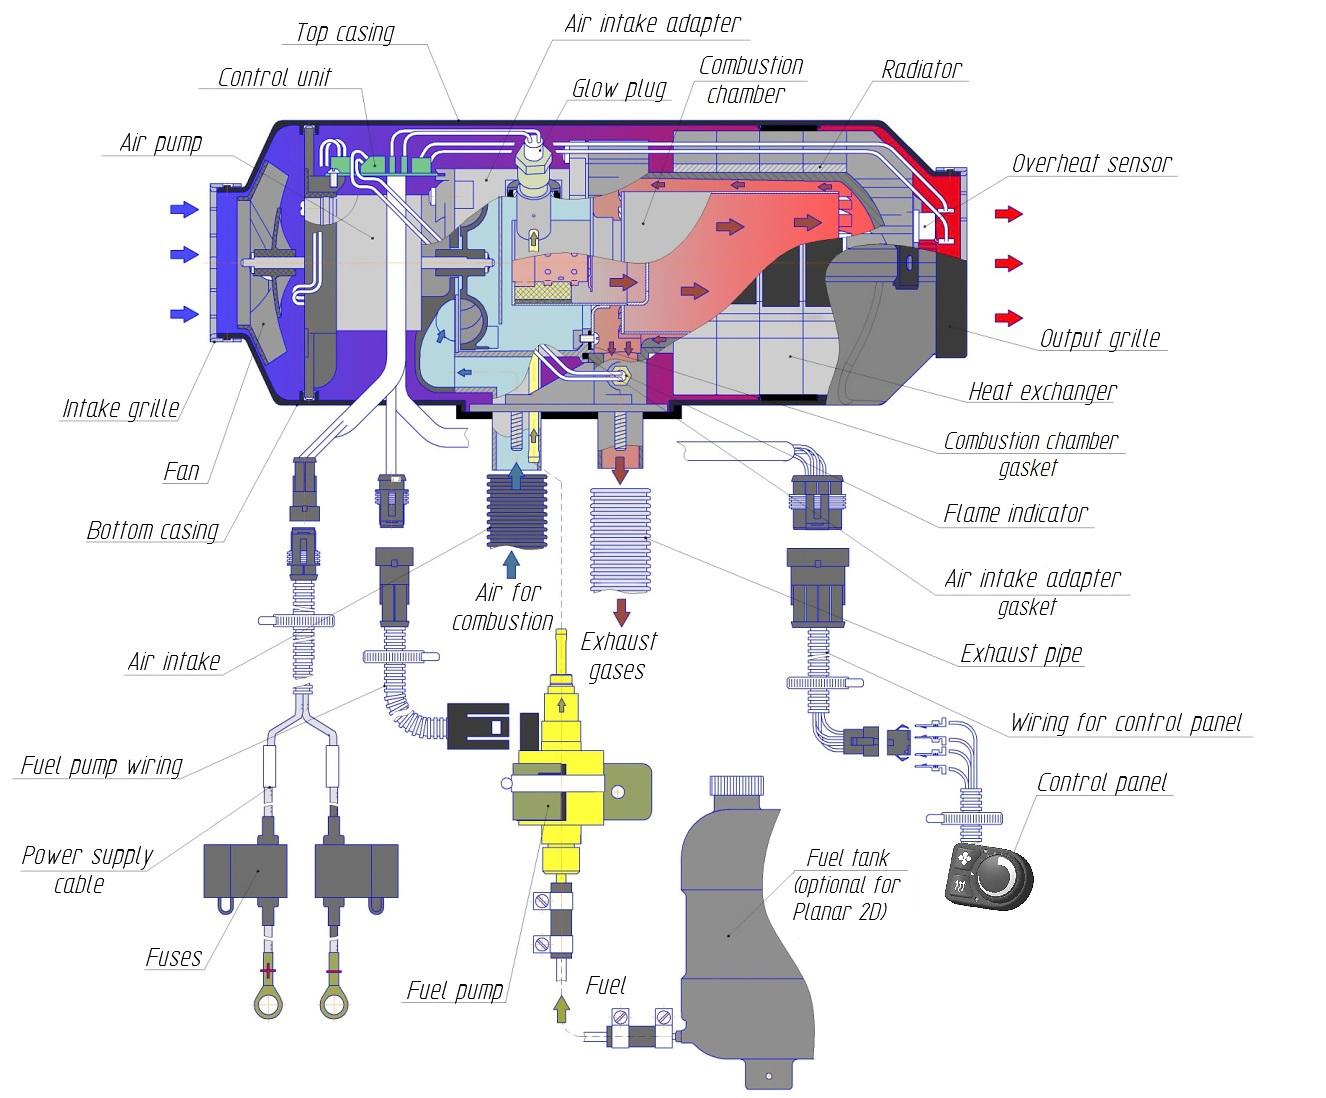 altendorf gmbh planar 2d 12 2kw standheizung inkl. Black Bedroom Furniture Sets. Home Design Ideas